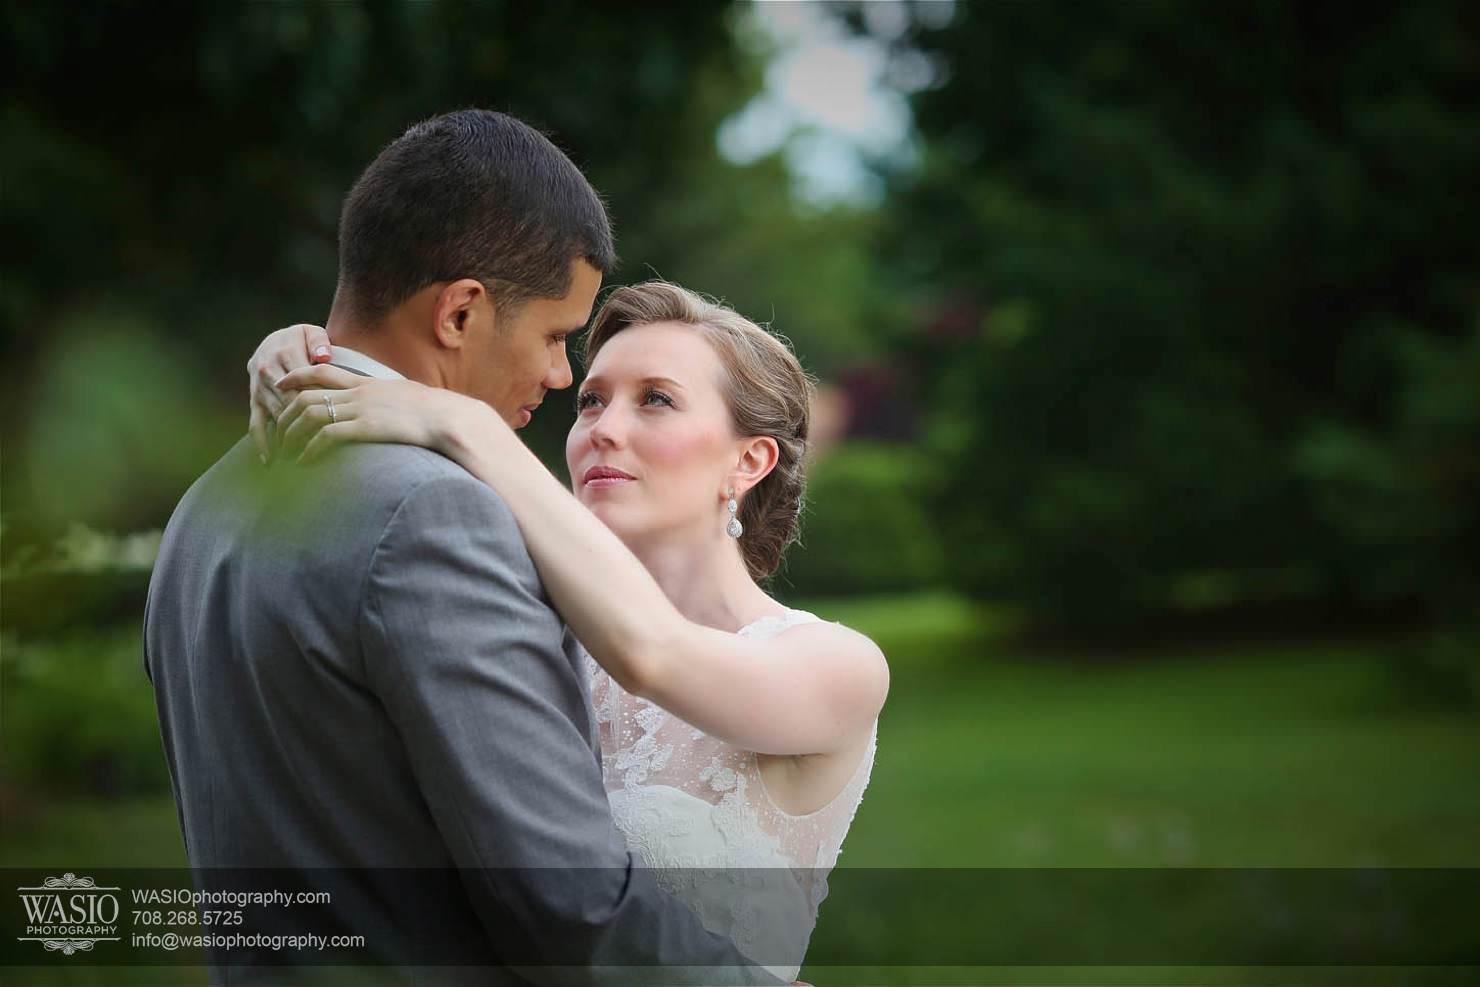 wedding-couple-love-bride-groom-summer Chevy Chase Country Club Wedding - Elizabeth & Michael